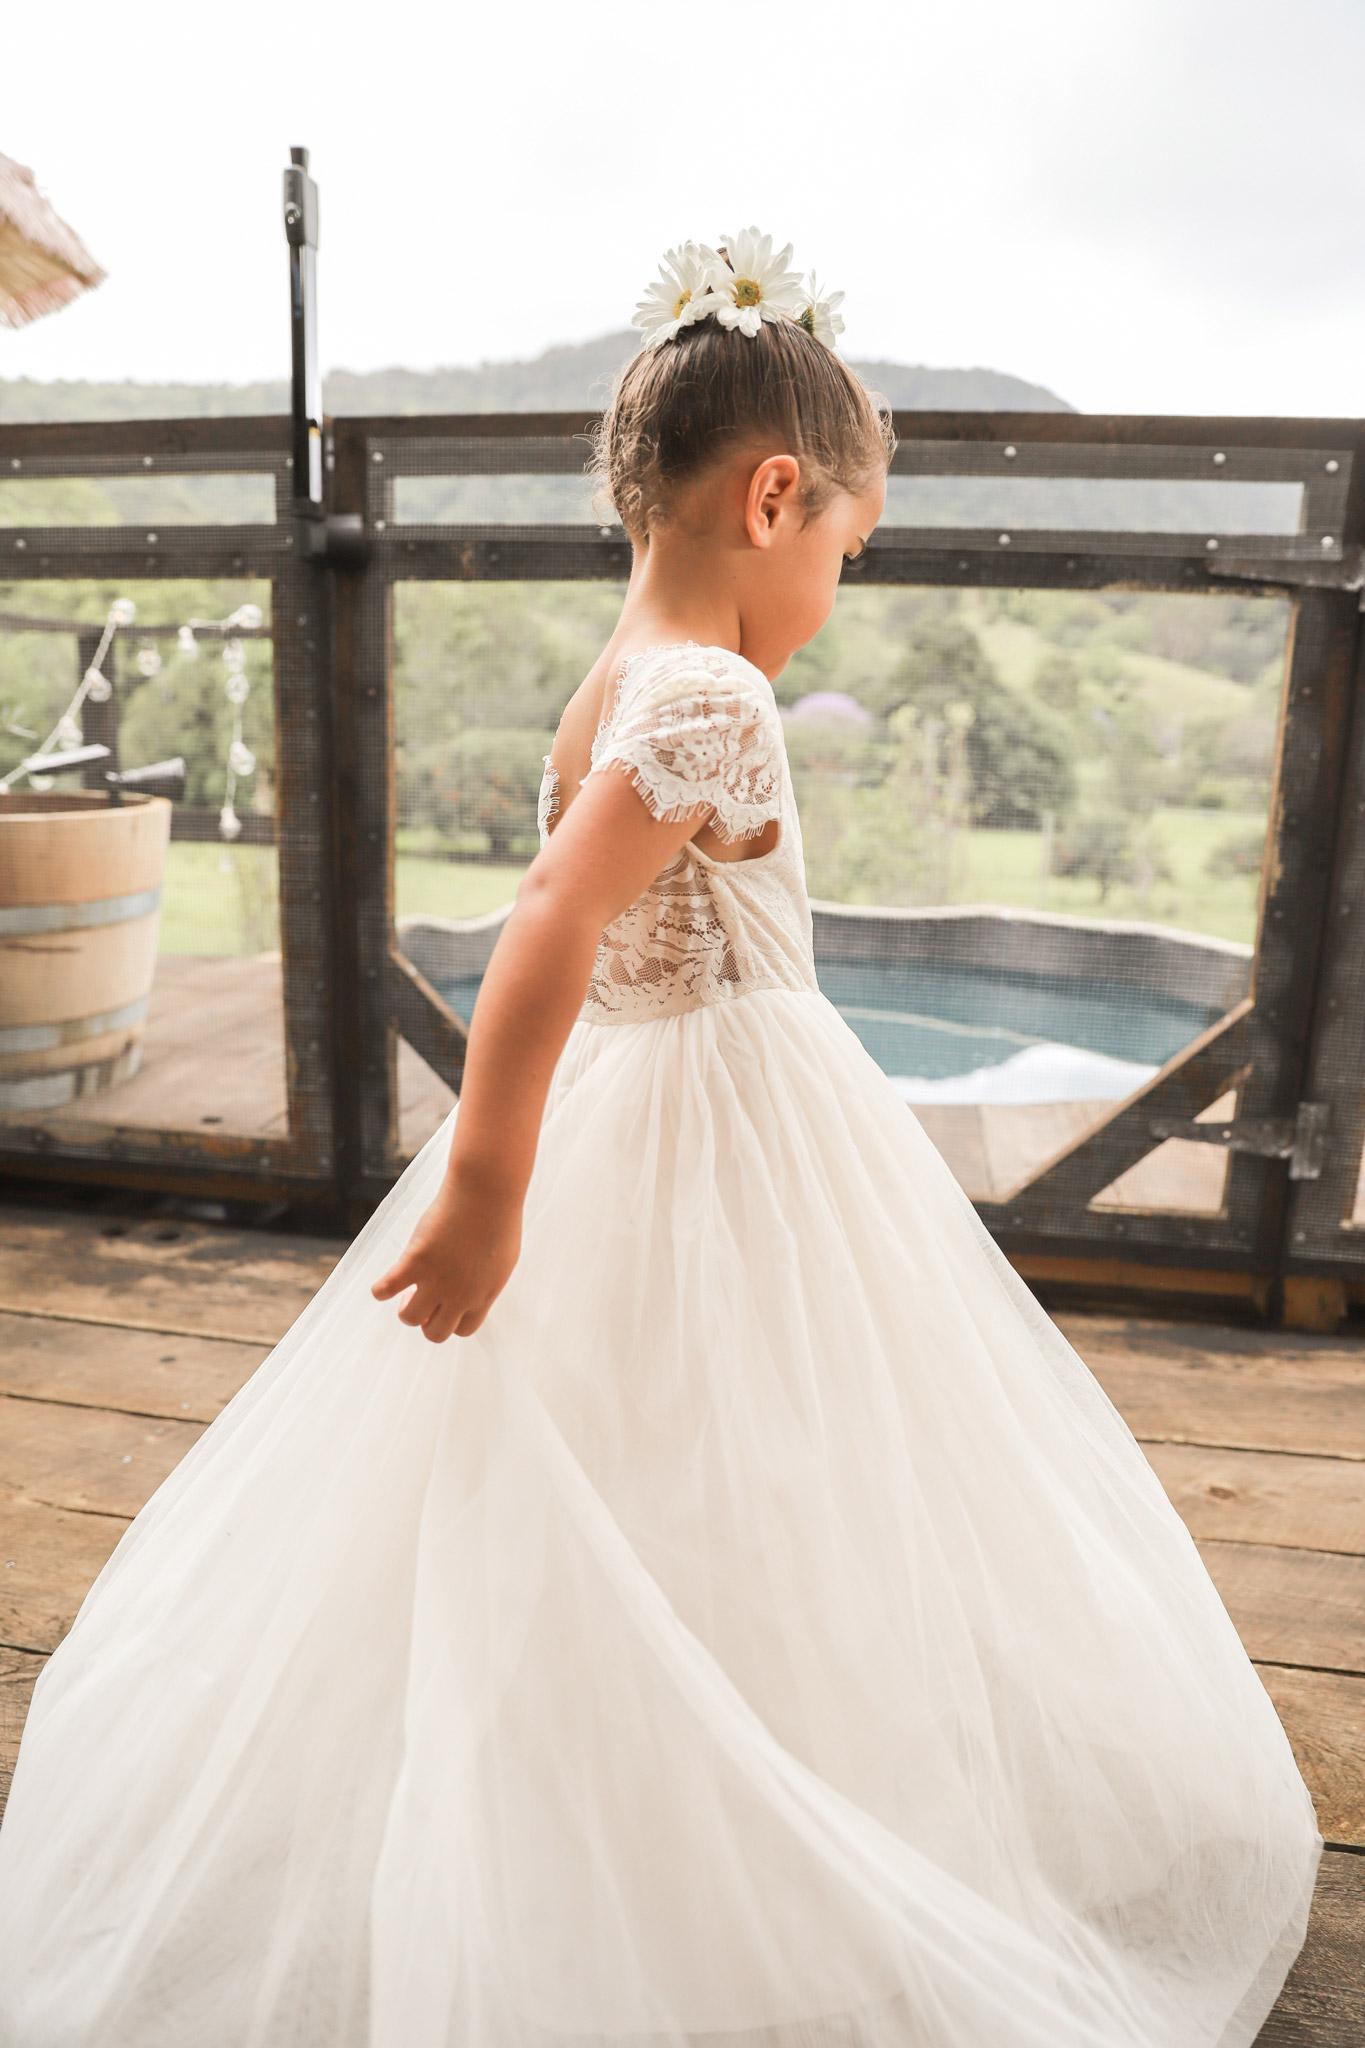 Girls Cream Magnolia Capped Sleeve Lace Back Flower Girl Dress